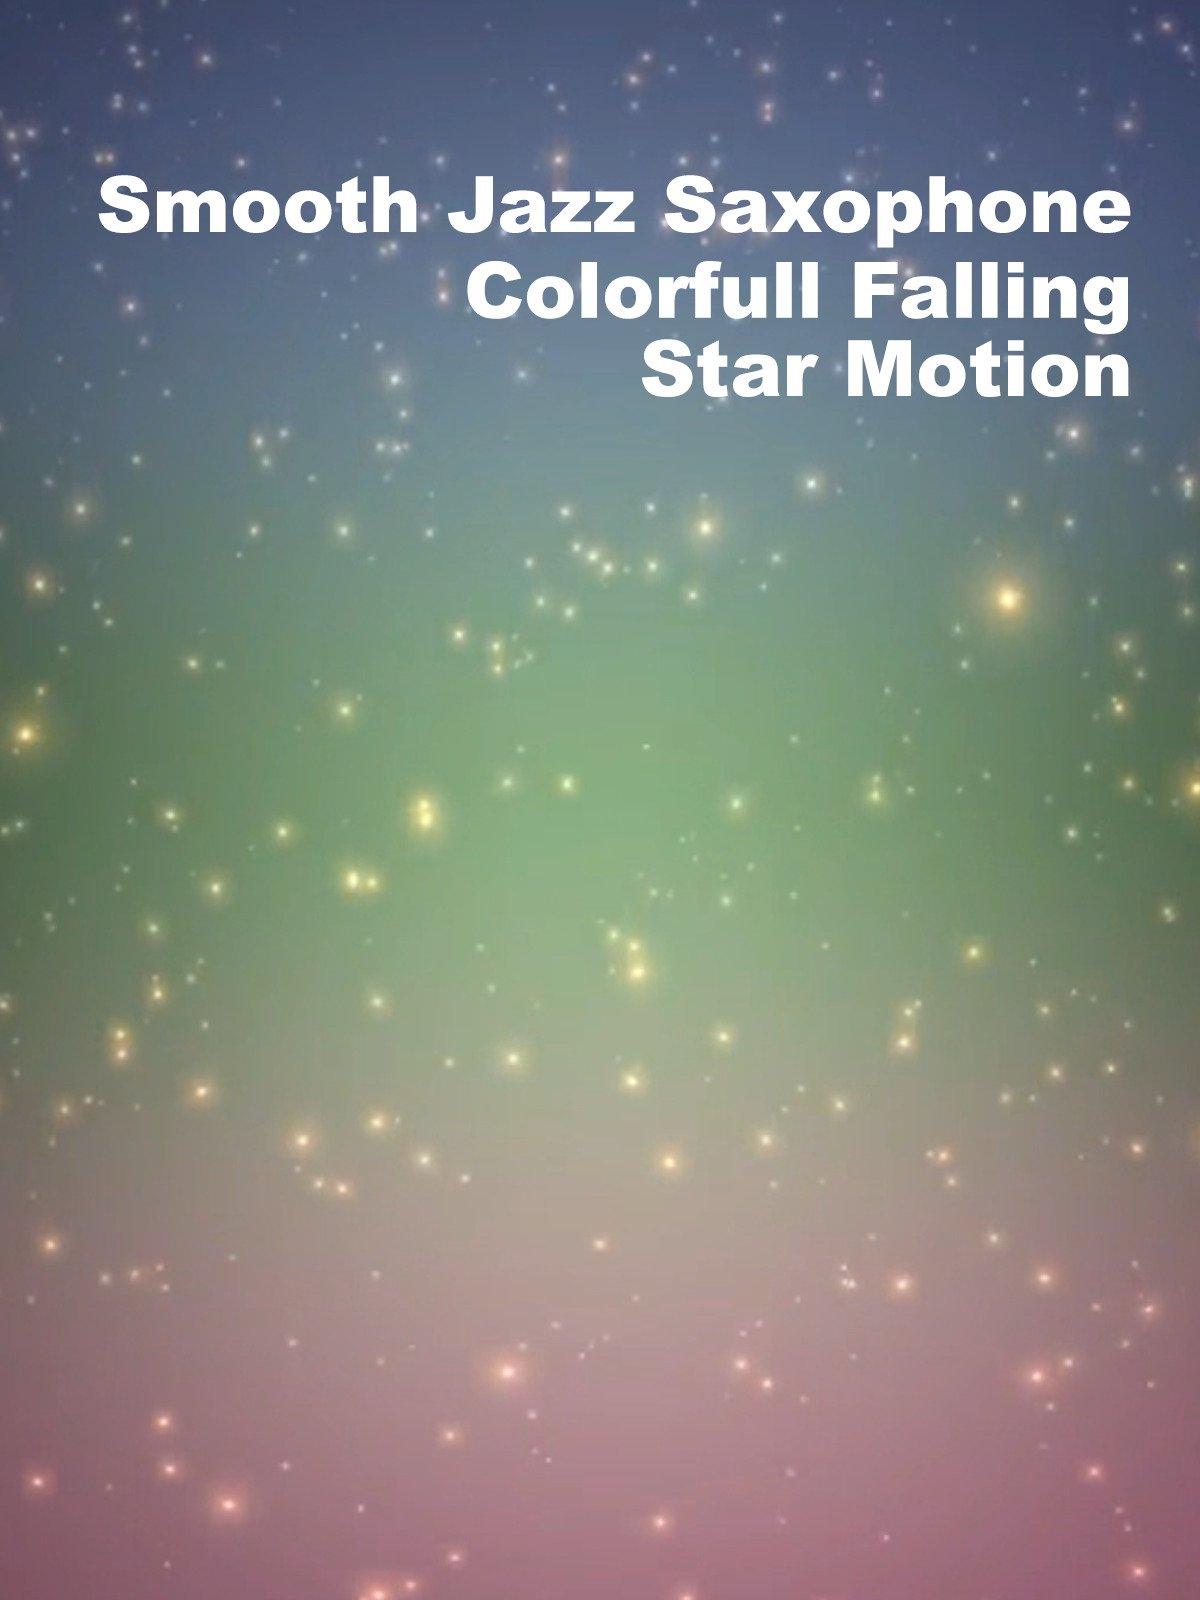 Smooth Jazz Saxophone Colorful Falling Star Motion on Amazon Prime Video UK